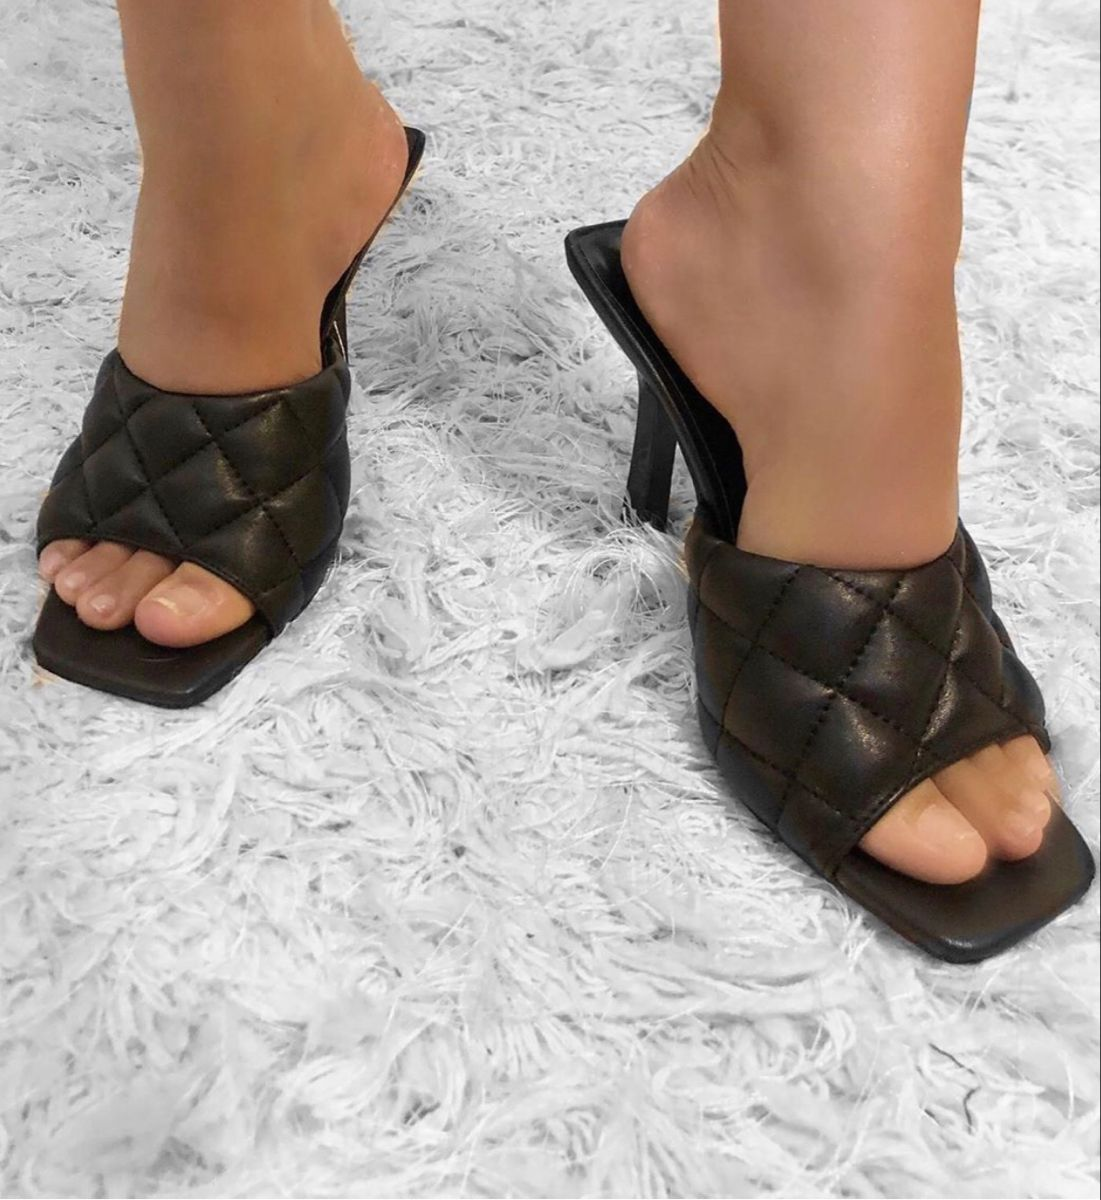 #shopping #heels #heelsaddict #heelsclassy #sandals #mules #mulesshoes #mulesheels #fashion #style #trendy #trending #summer #summerstyle #ootd #ootdfashion